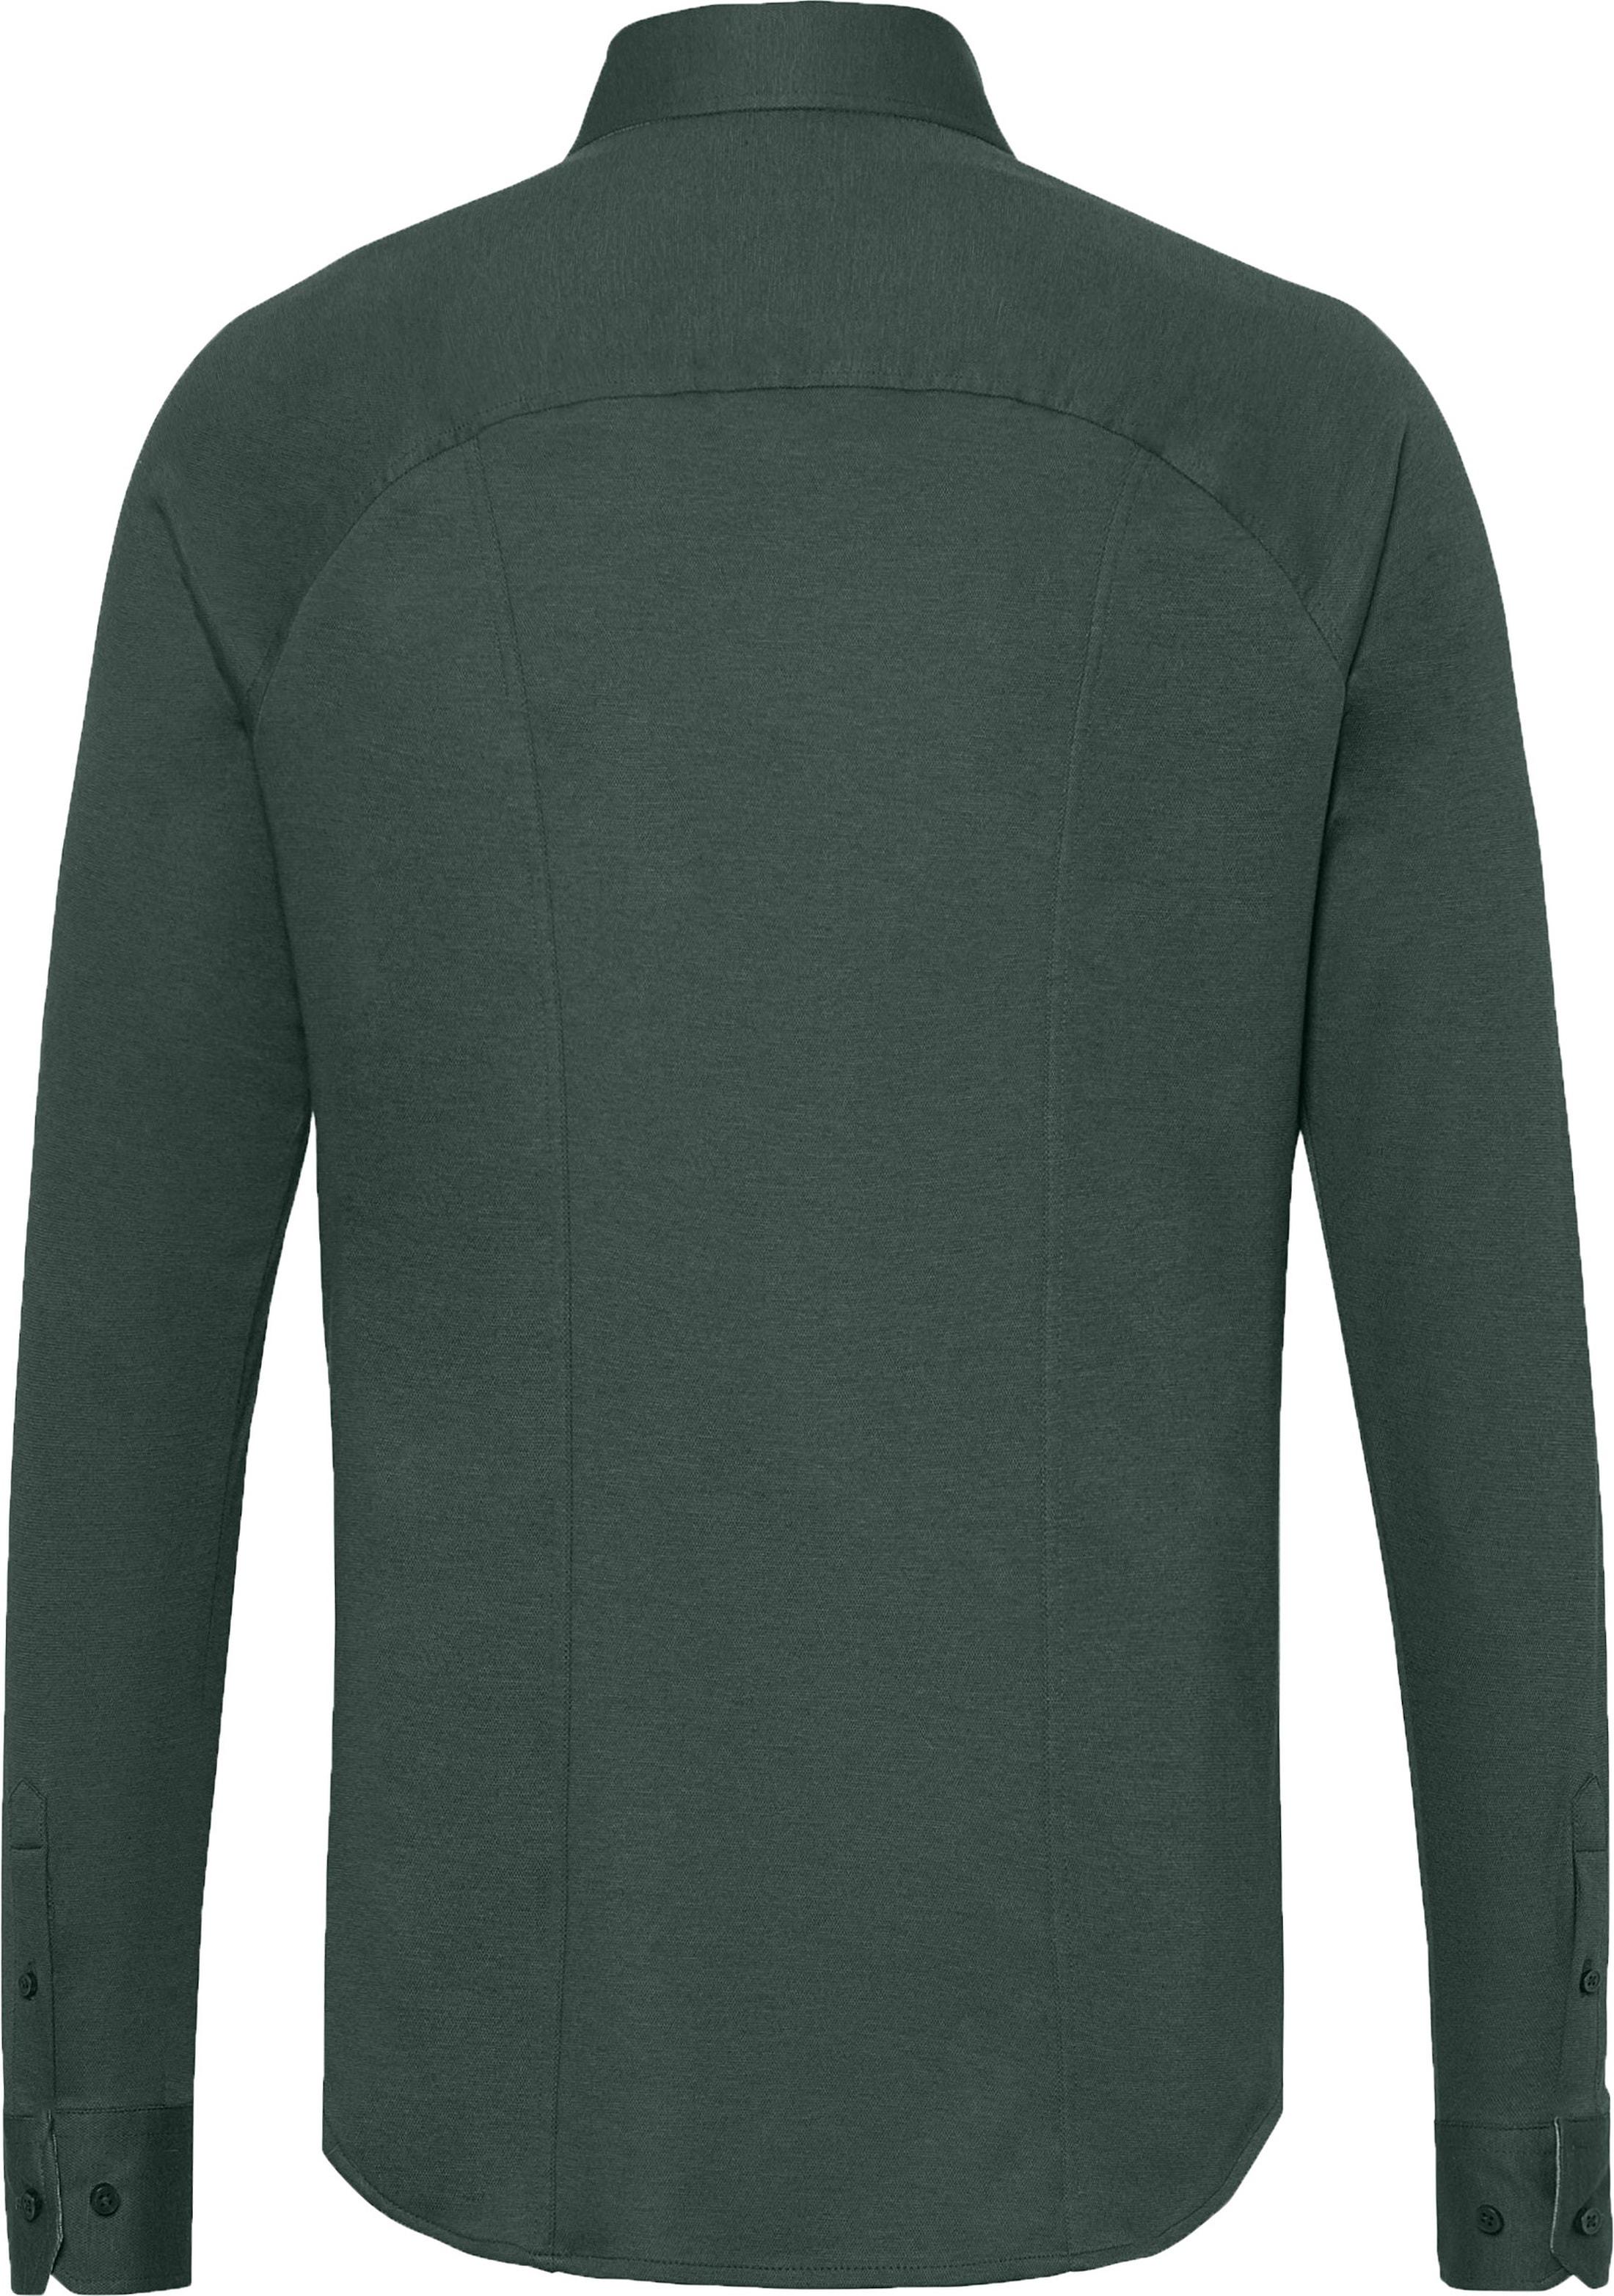 Desoto Overhemd Strijkvrij Donkergroen 602 foto 2